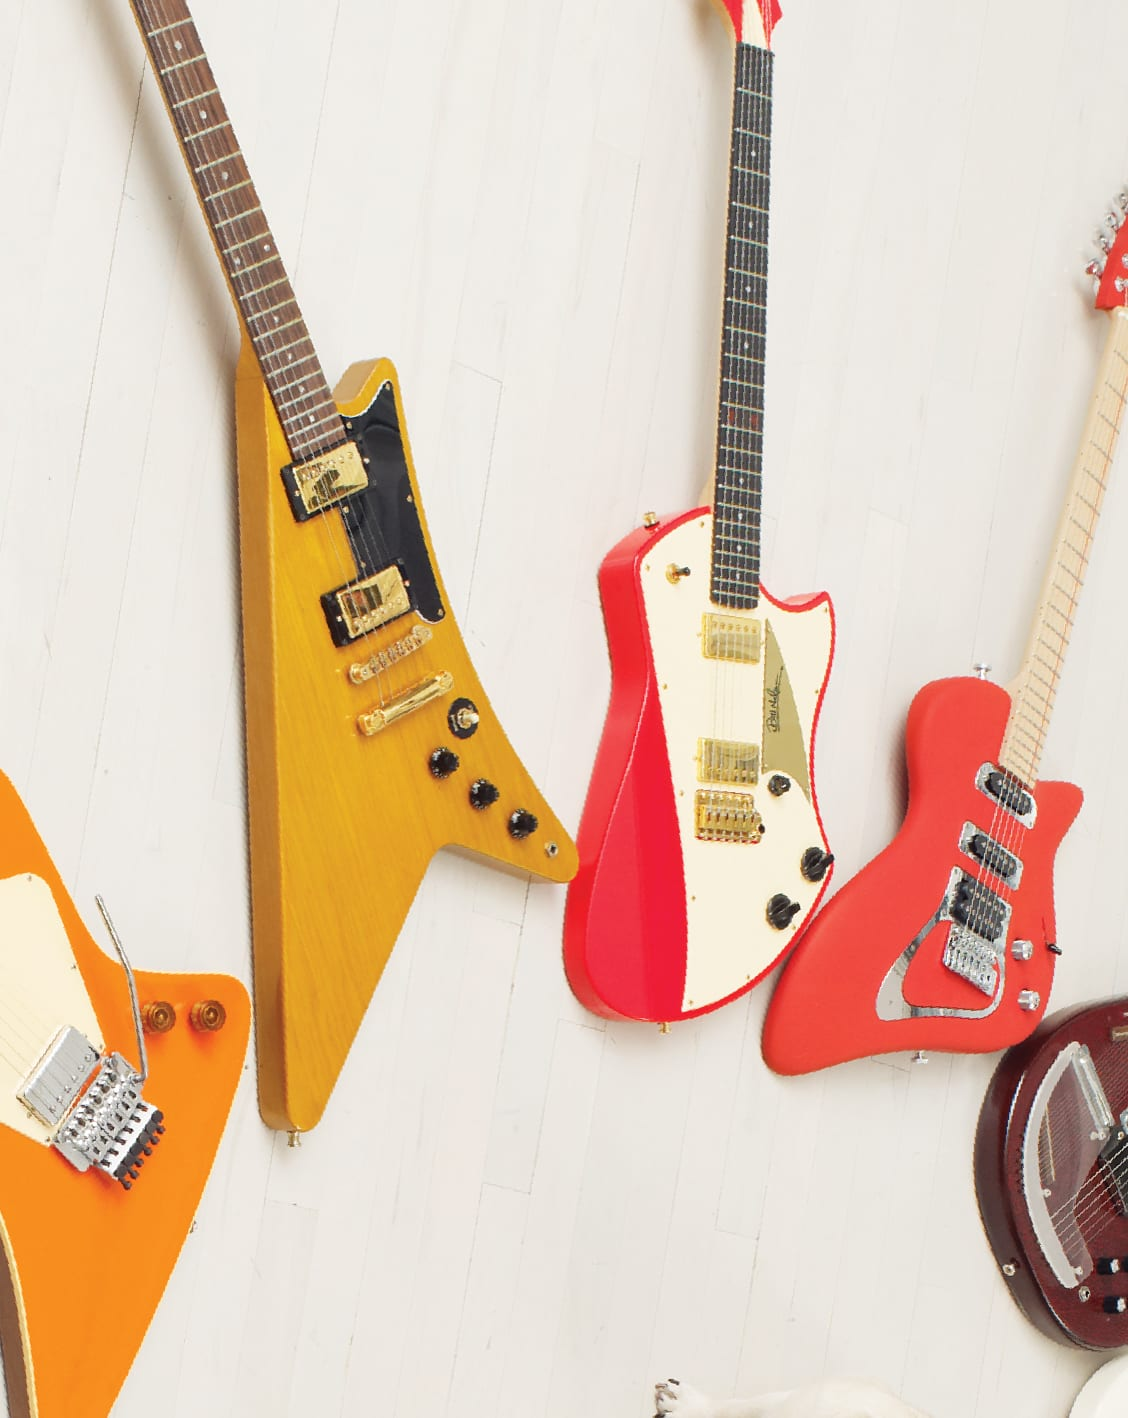 From left, Hendrick Generator, Gibson Moderne, Campbell America, Nelsonic Transitone, Andreas Shark.